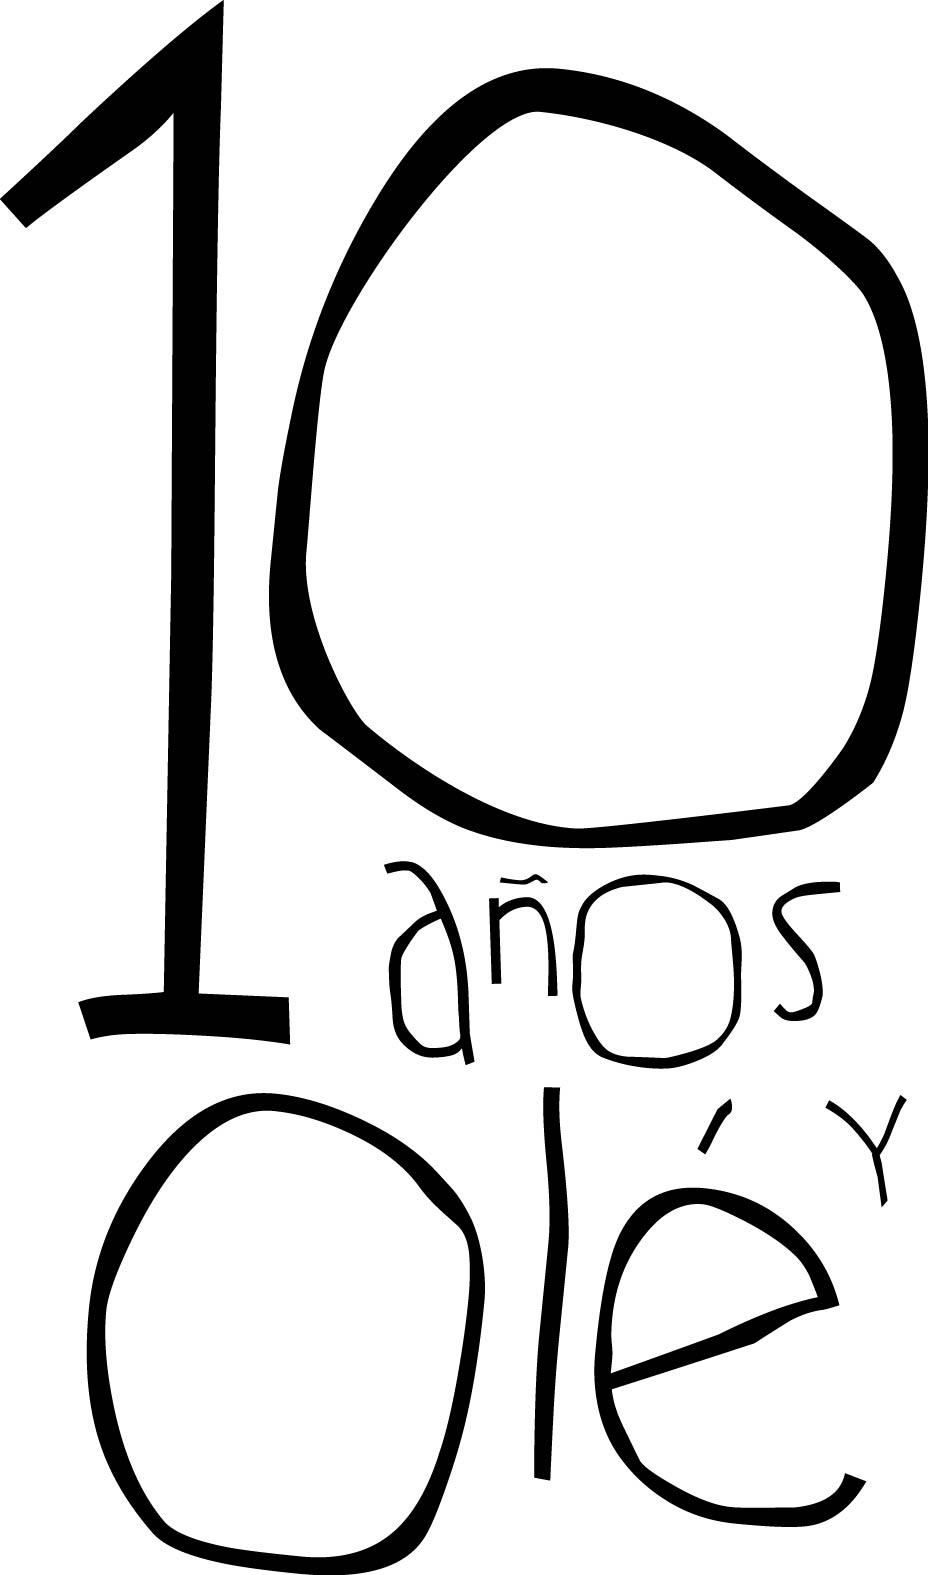 Logo 10 aniversario Negro.jpg